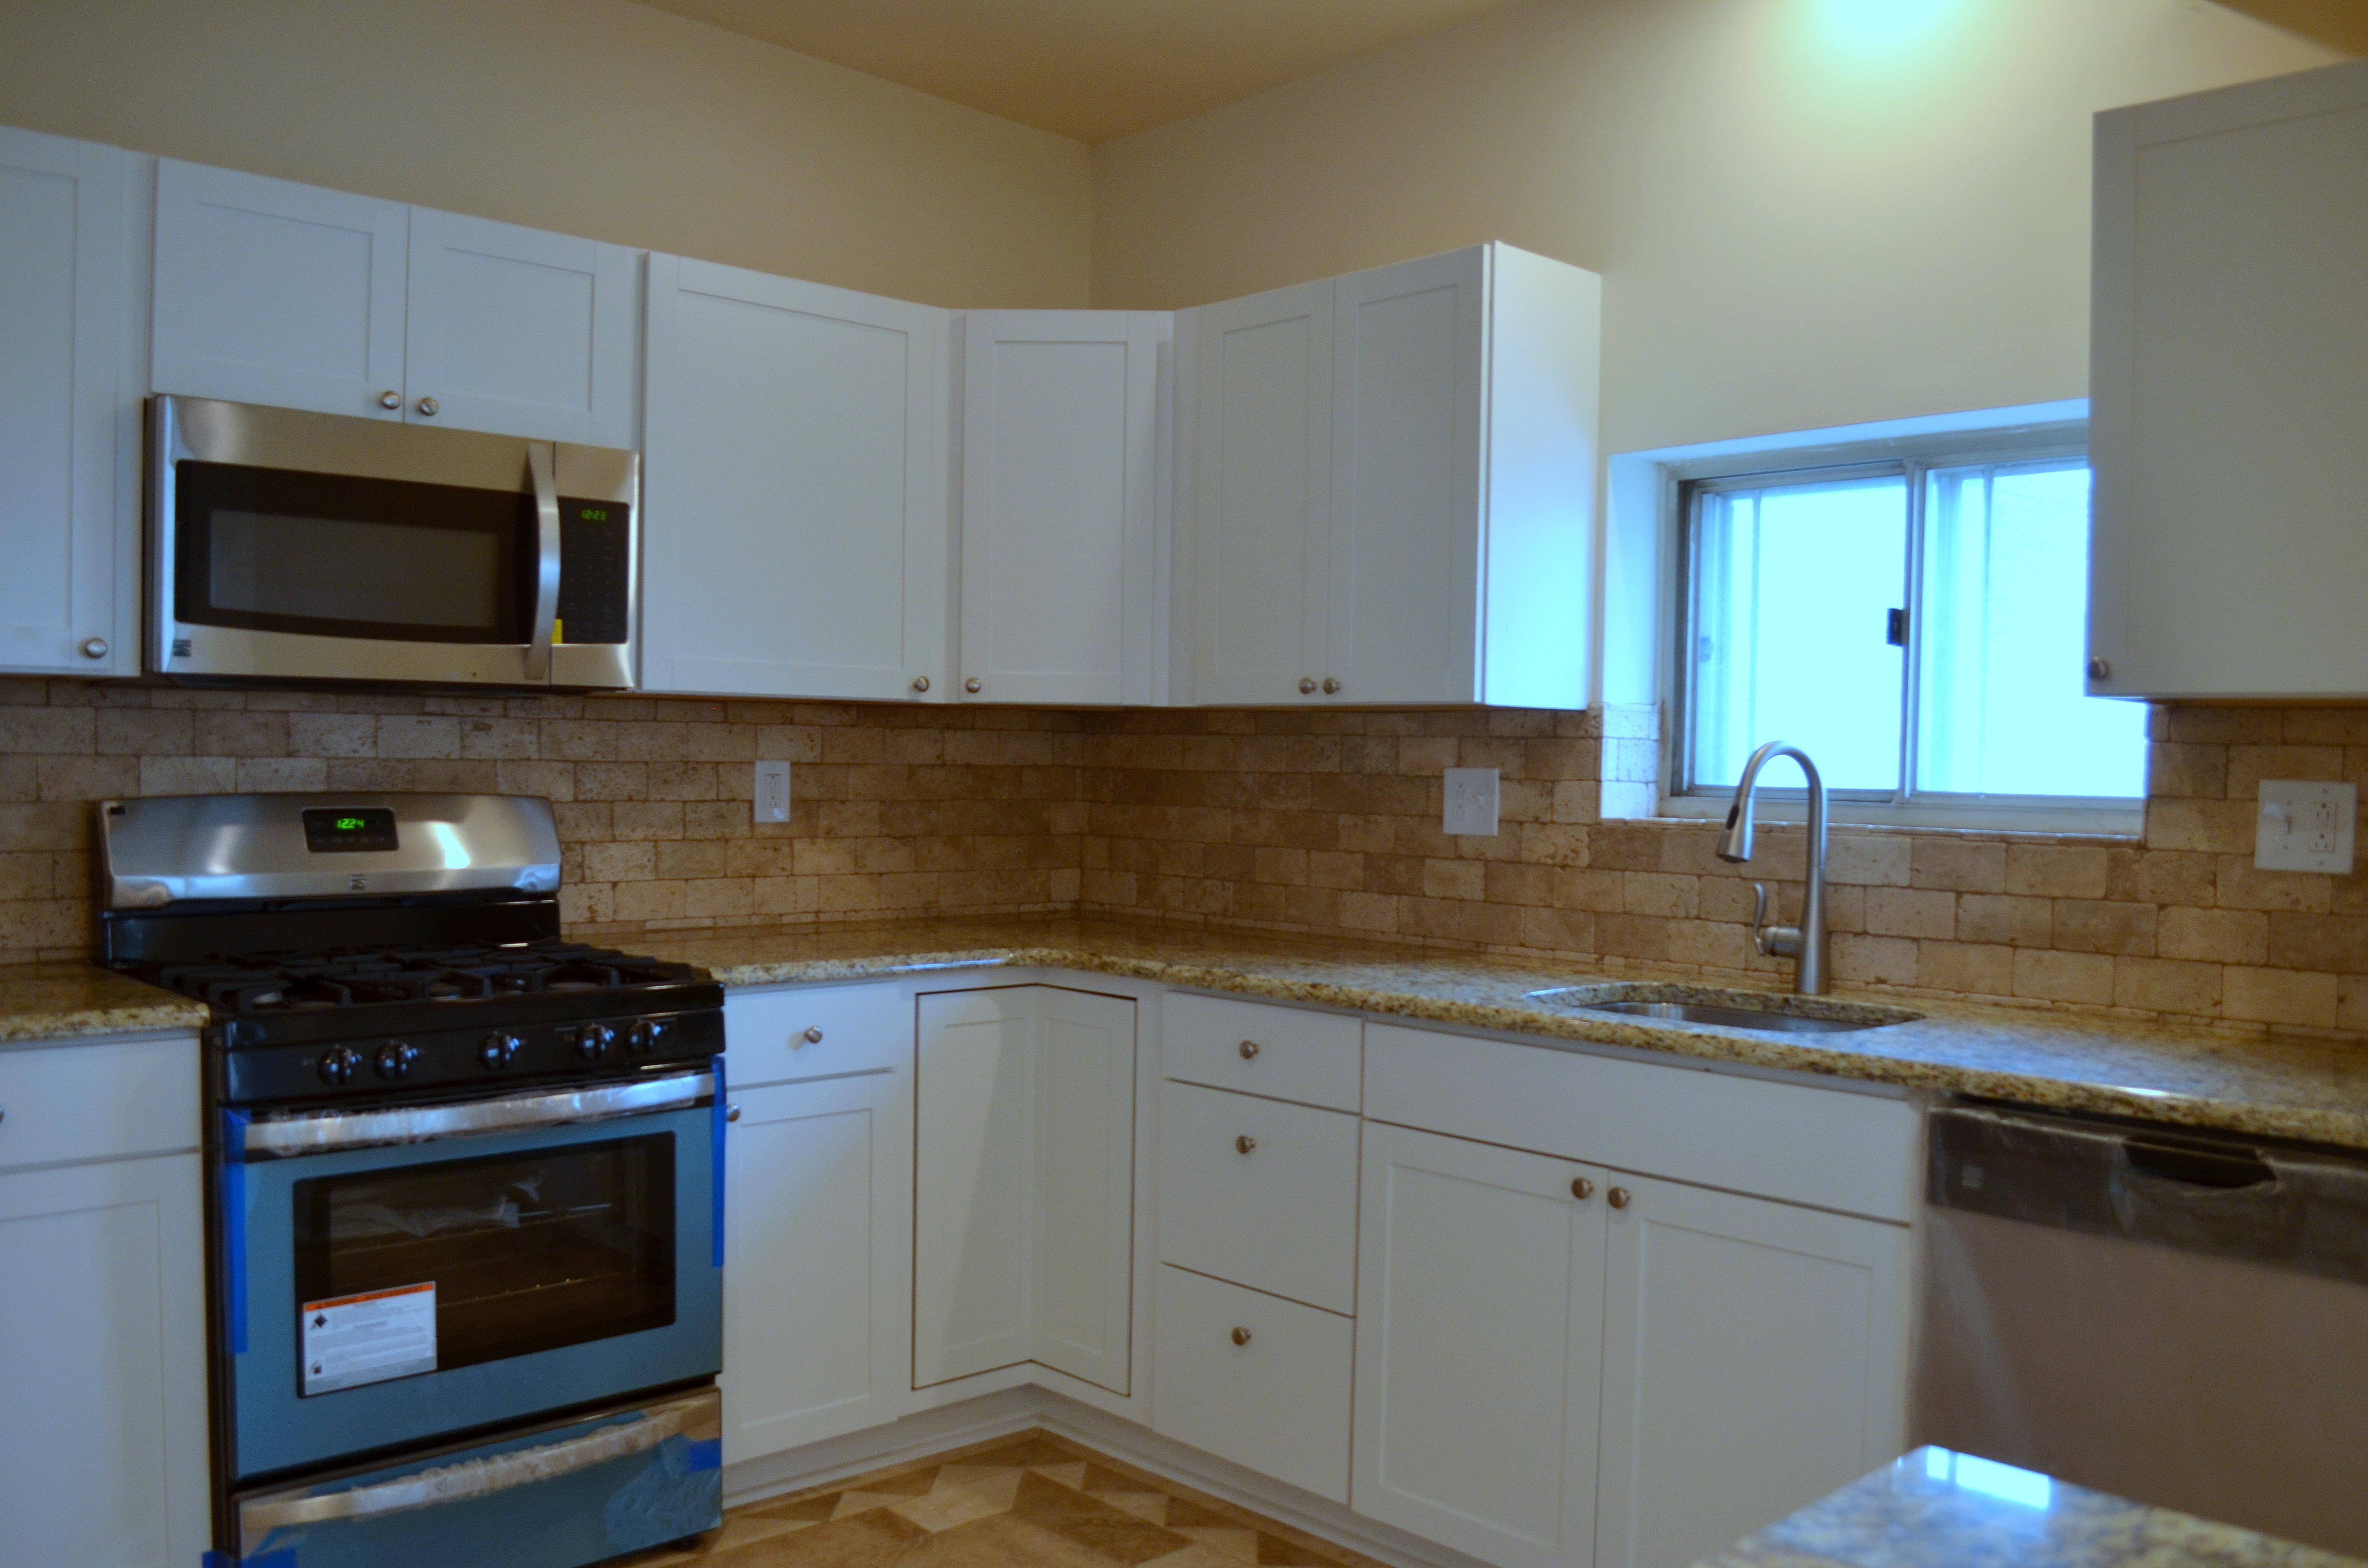 441 Cherry St, Pottstown, PA 19464 - kitchen_3